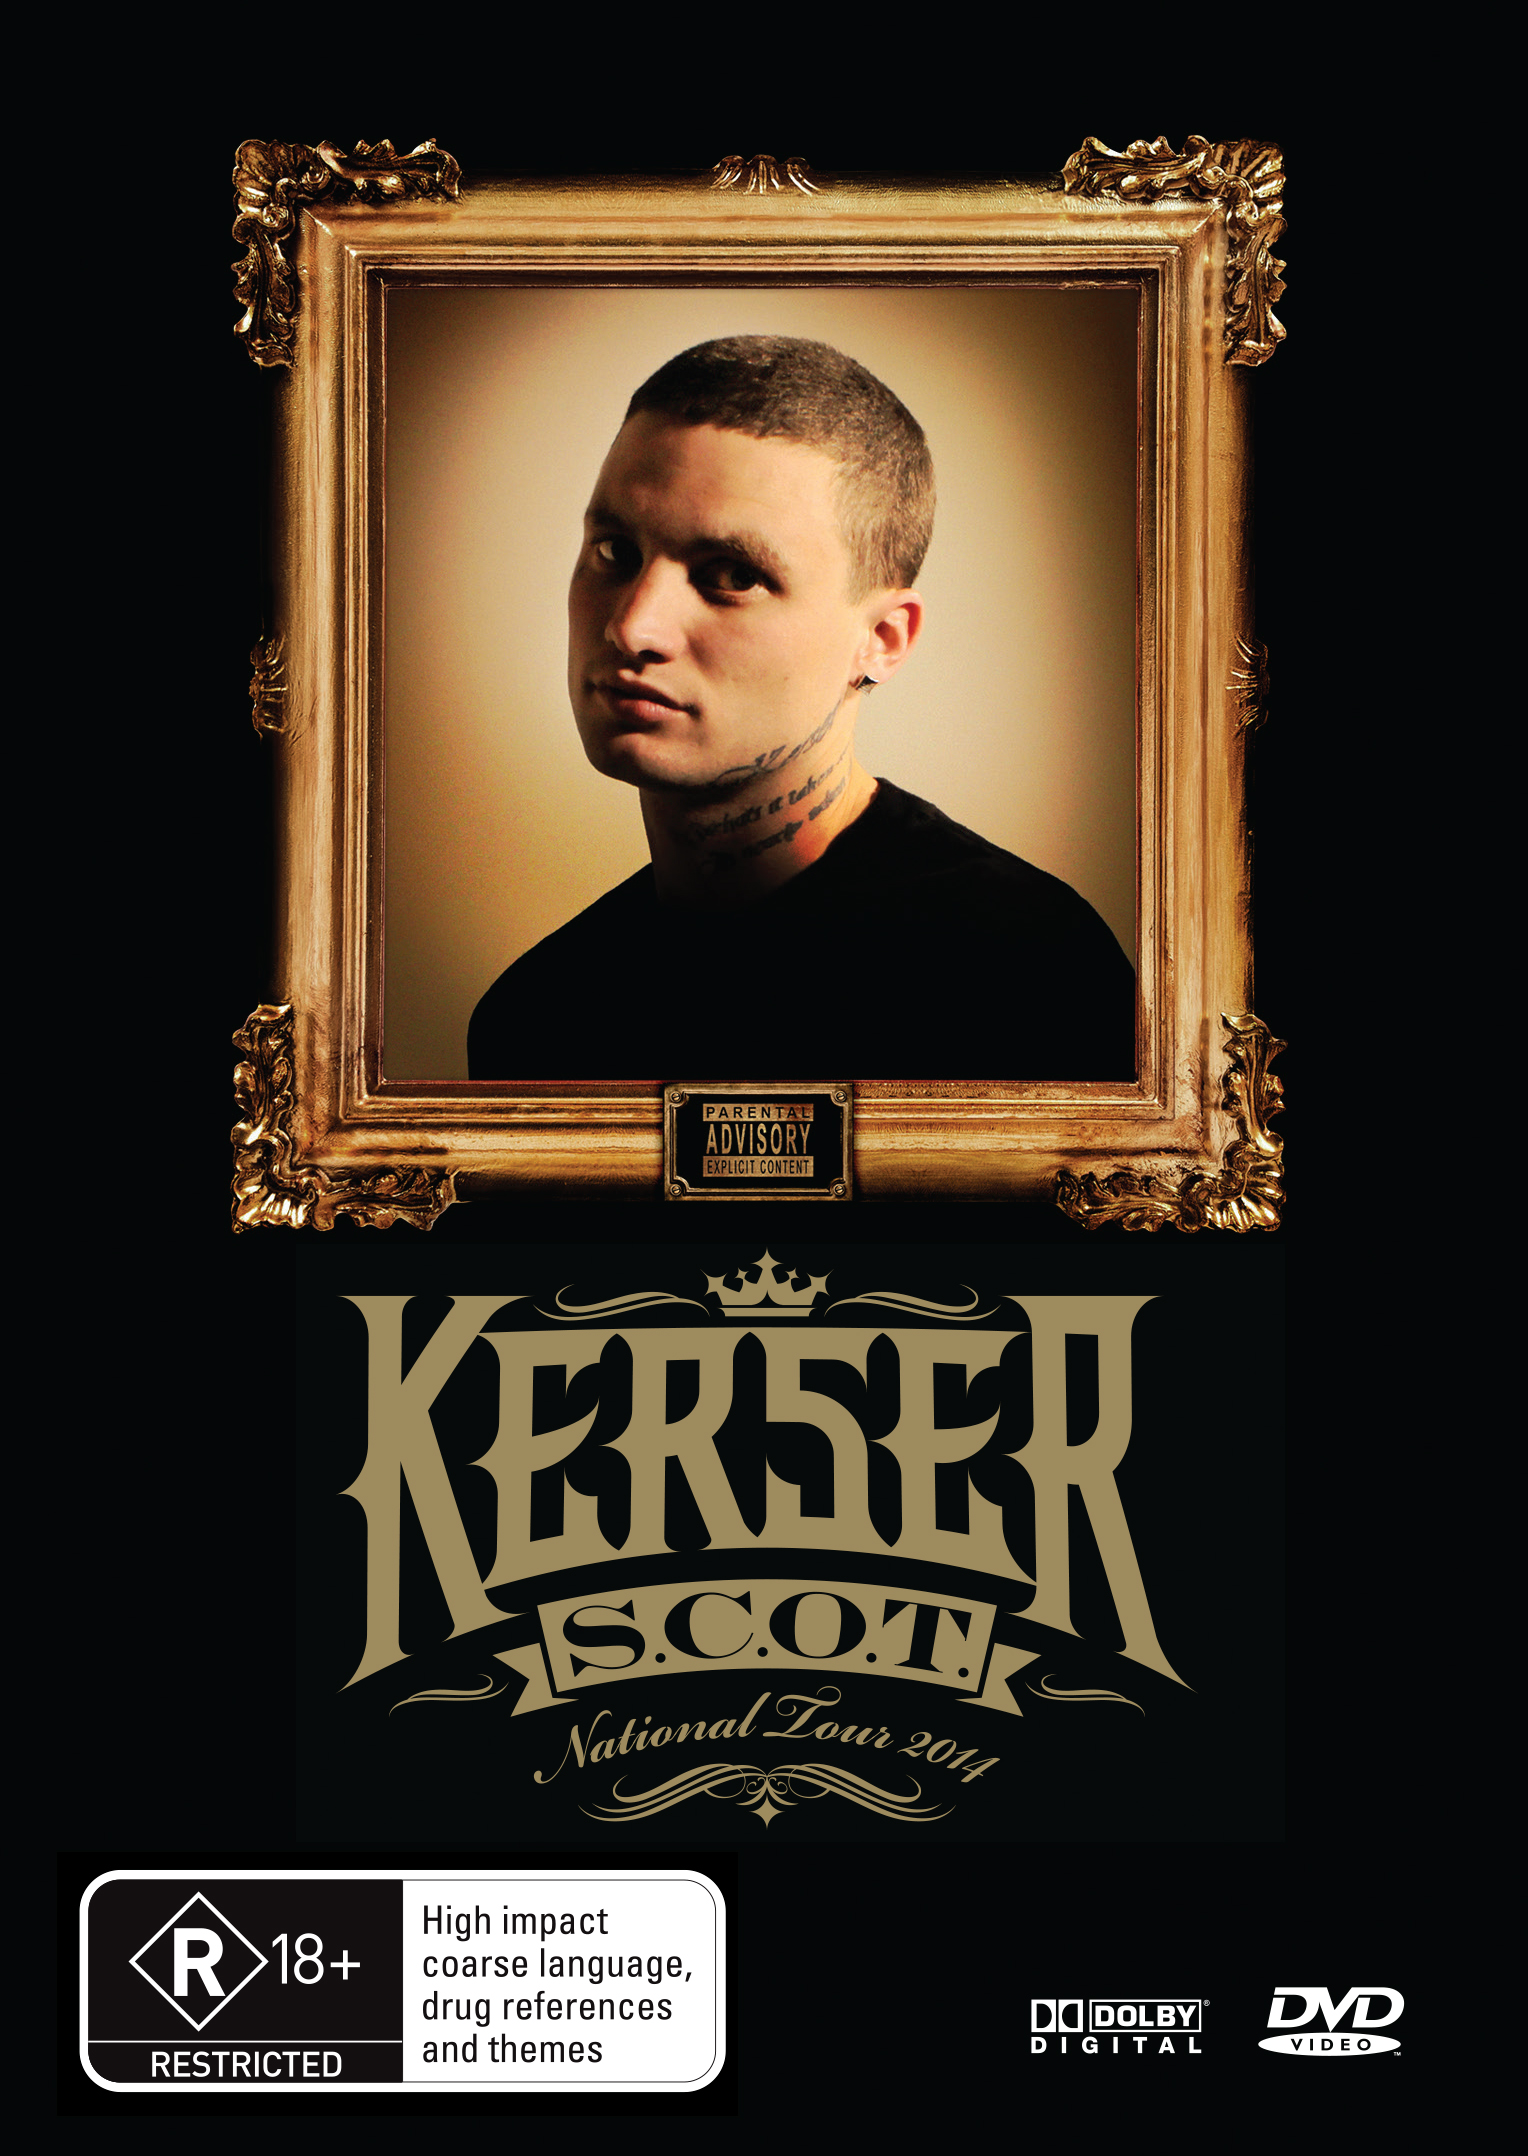 KERS 009 - Kerser S.C.O.T DVD Cover (Hi-Res)